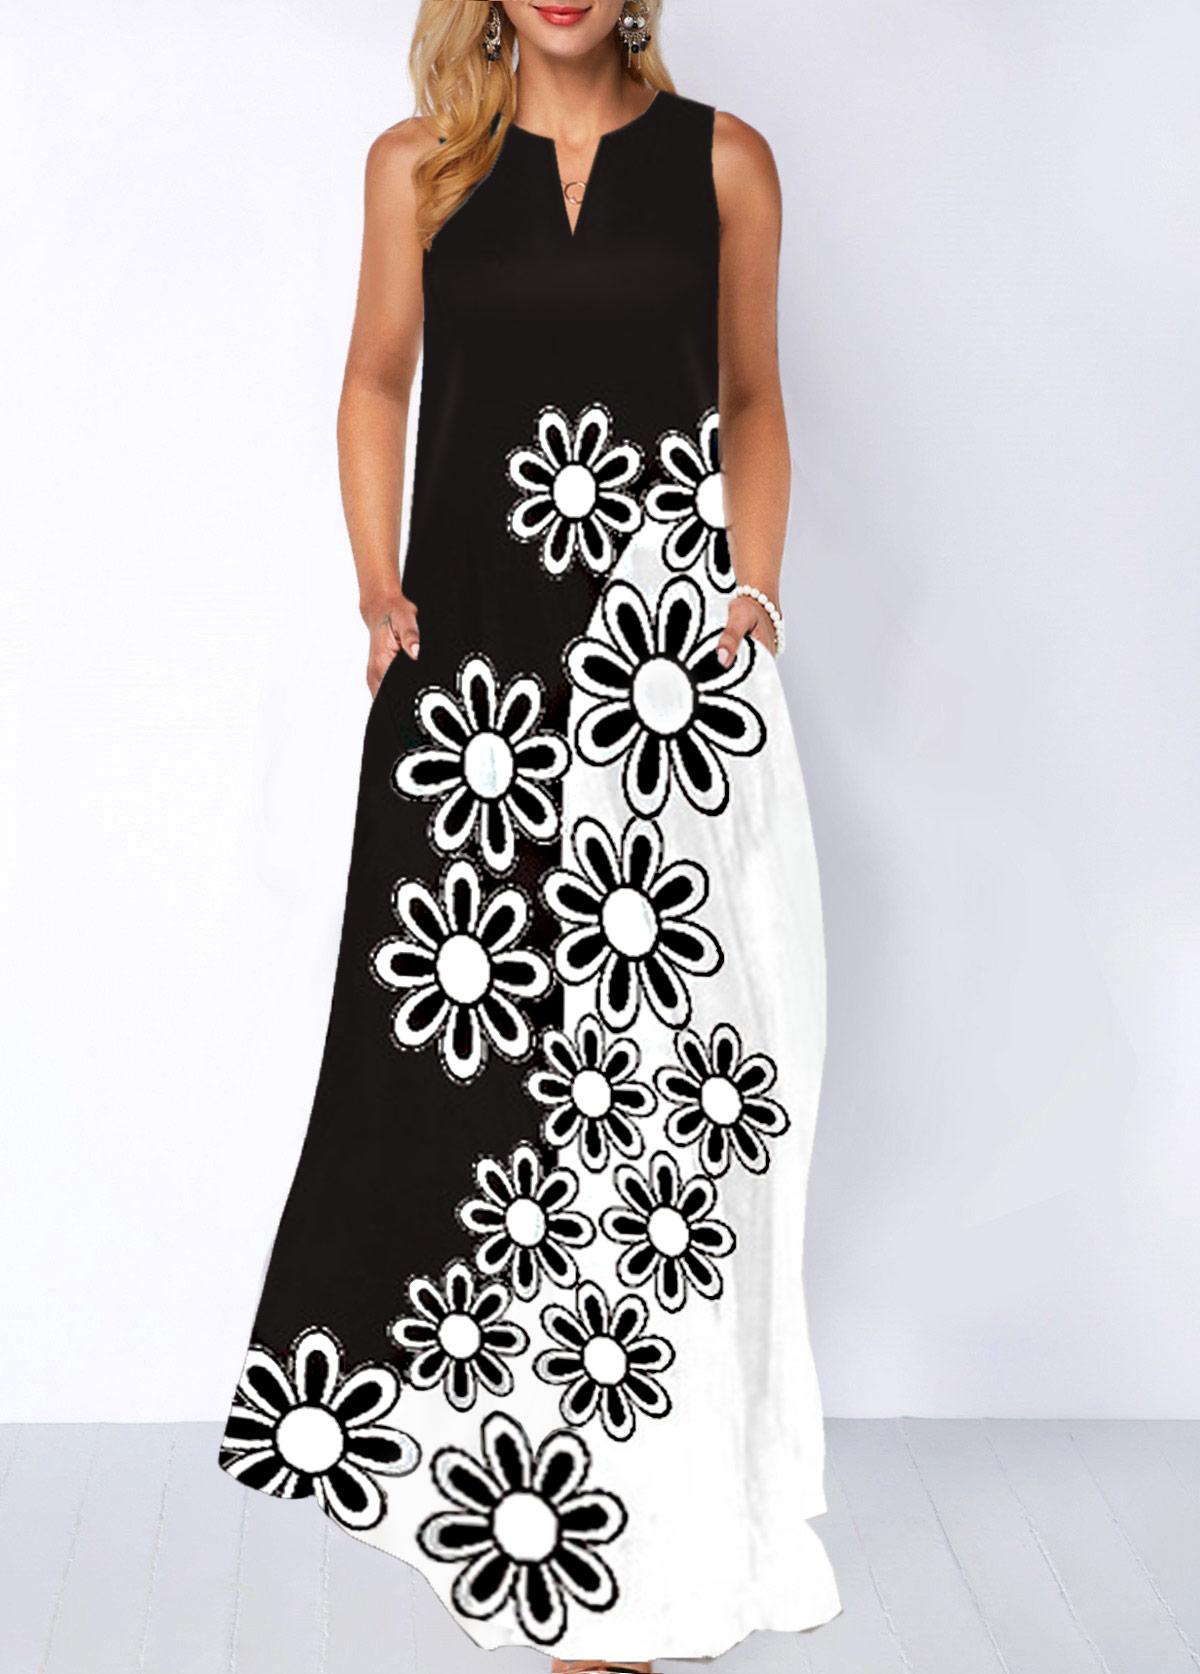 Floral Print Split Neck Sleeveless Dress